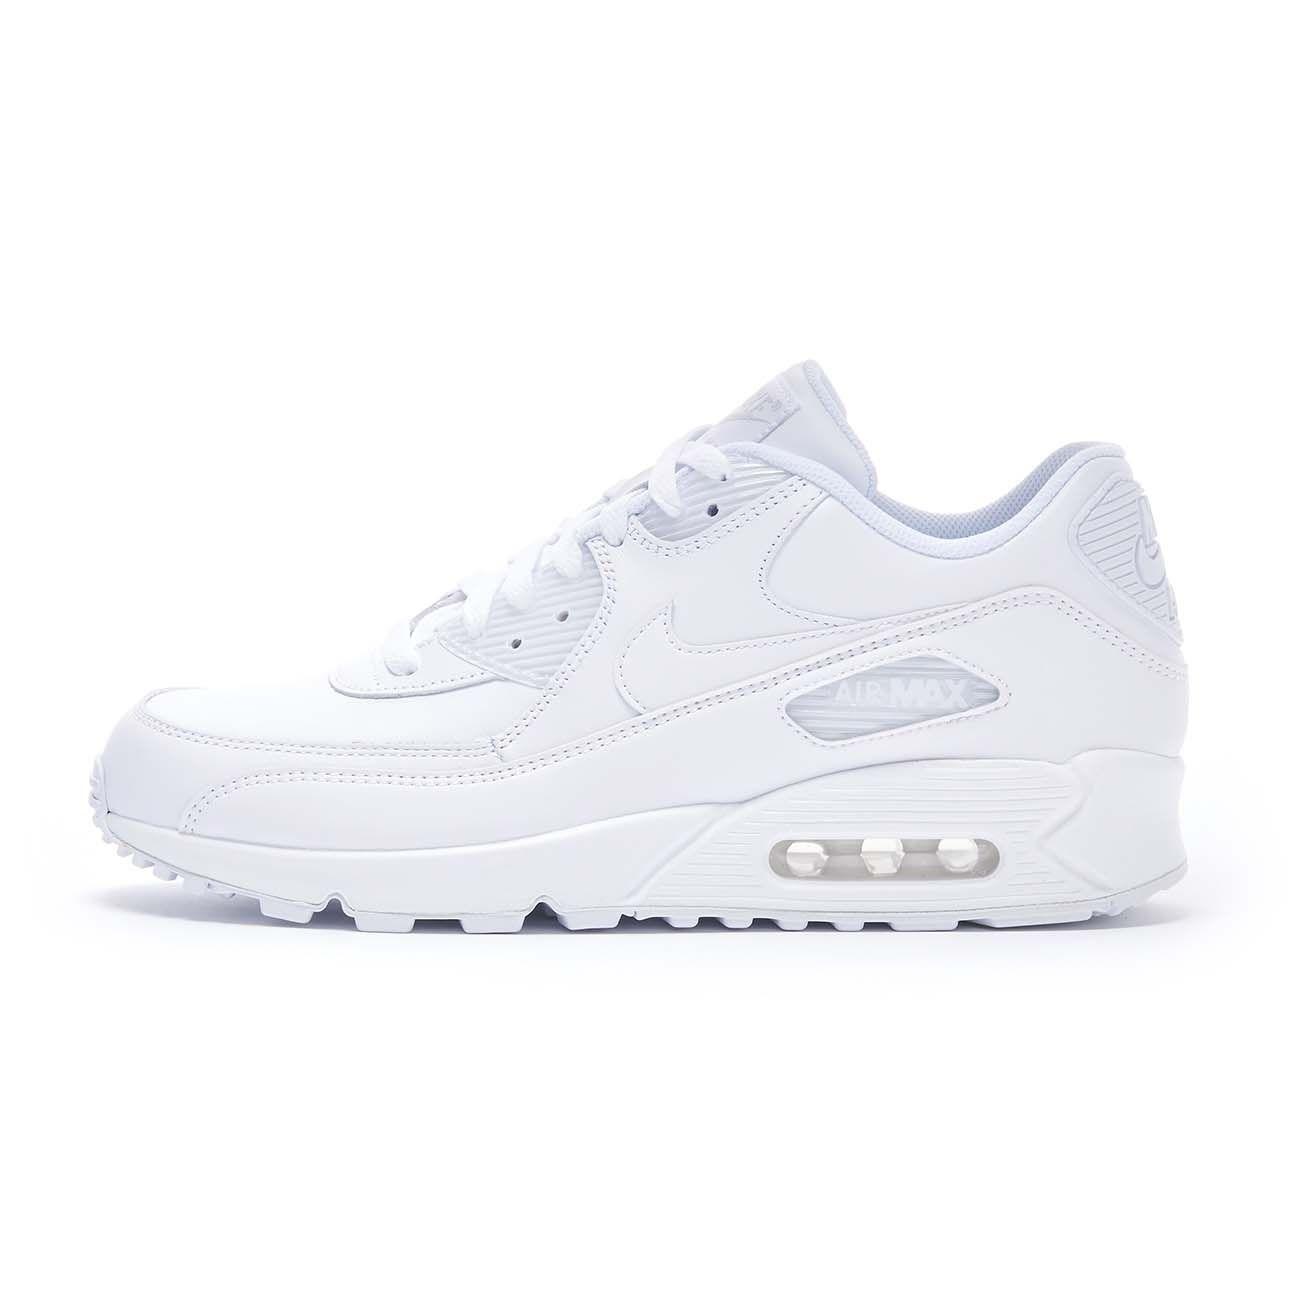 NIKE SNEAKERS AIR MAX 90 LEATHER Uomo White   Mascheroni Sportswear